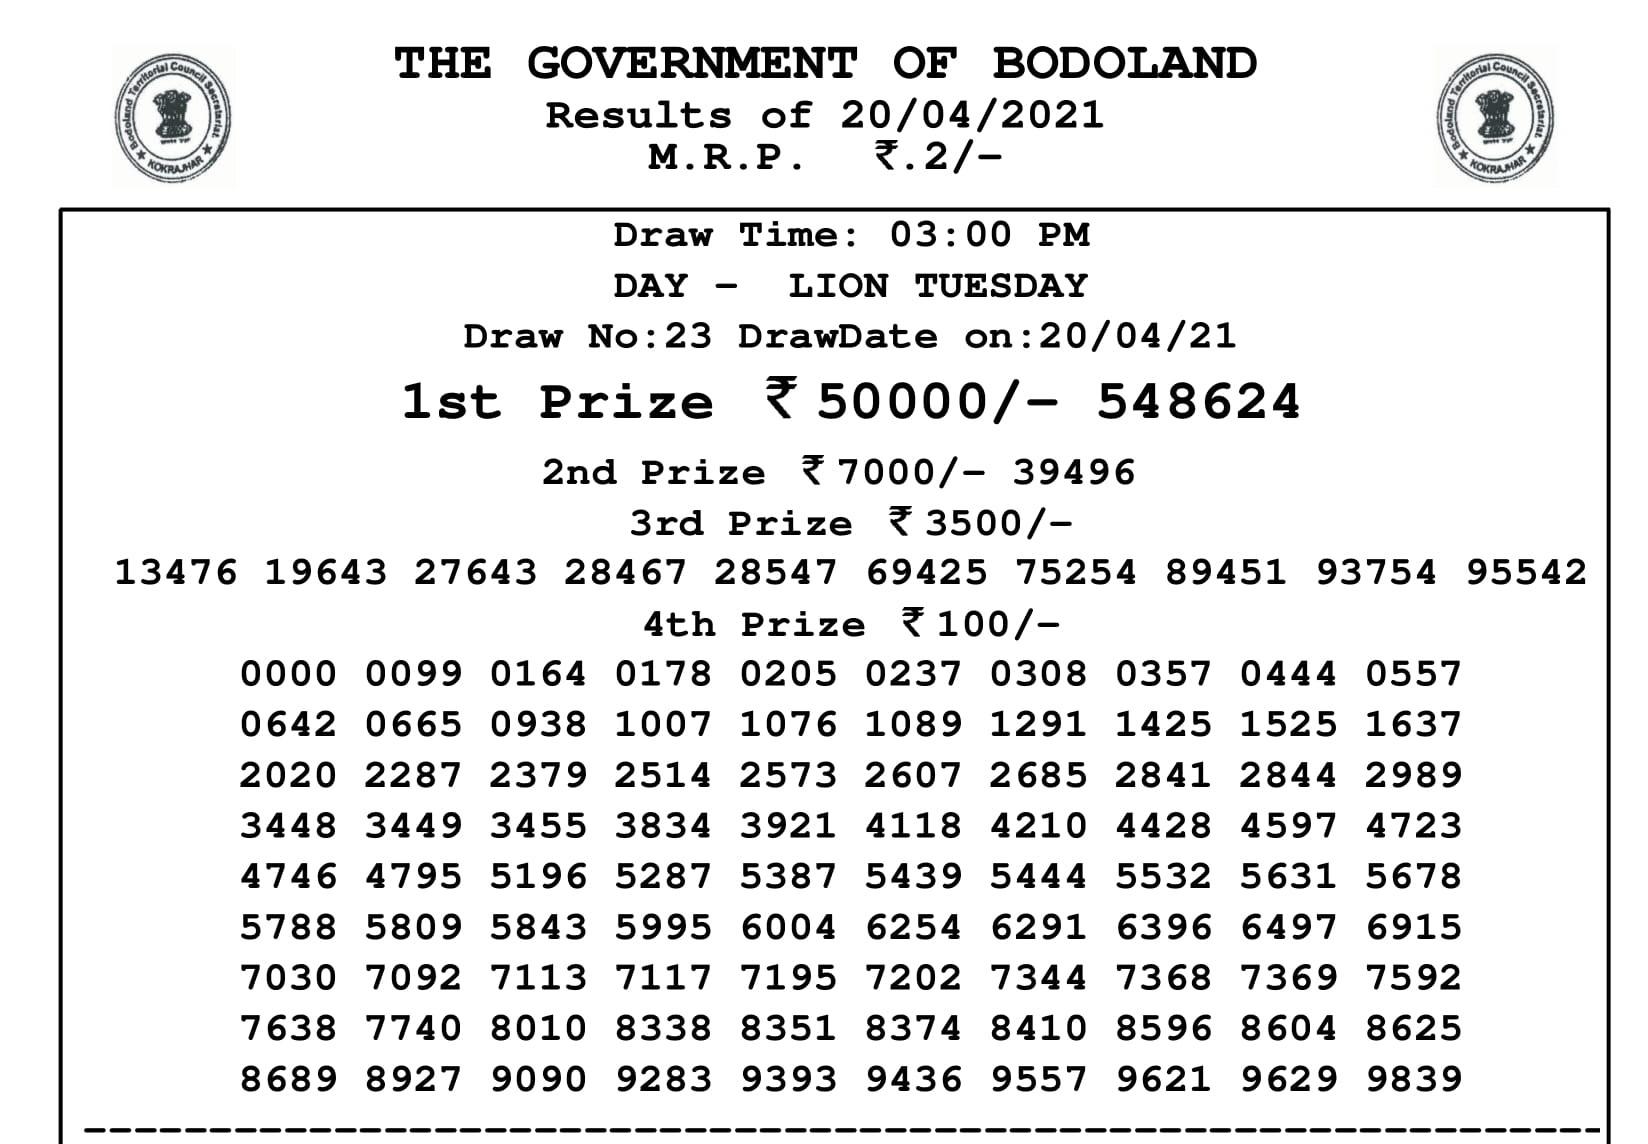 Bodoland lottery Result 20.4.2021